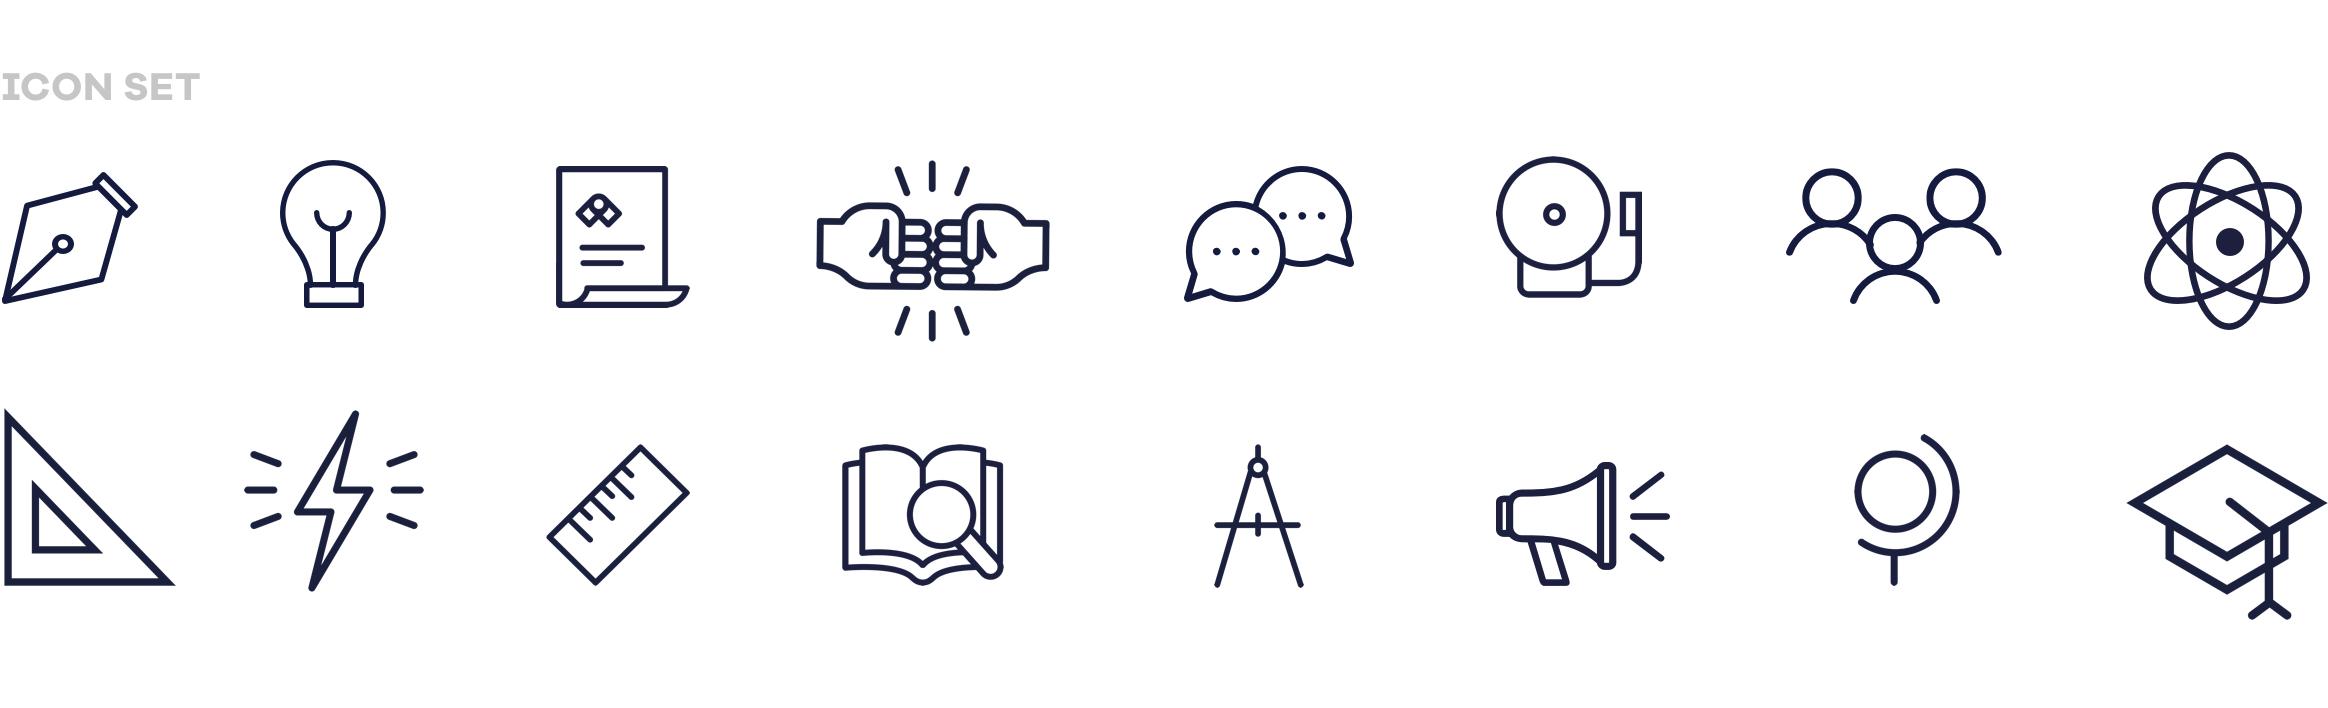 icon set desktop